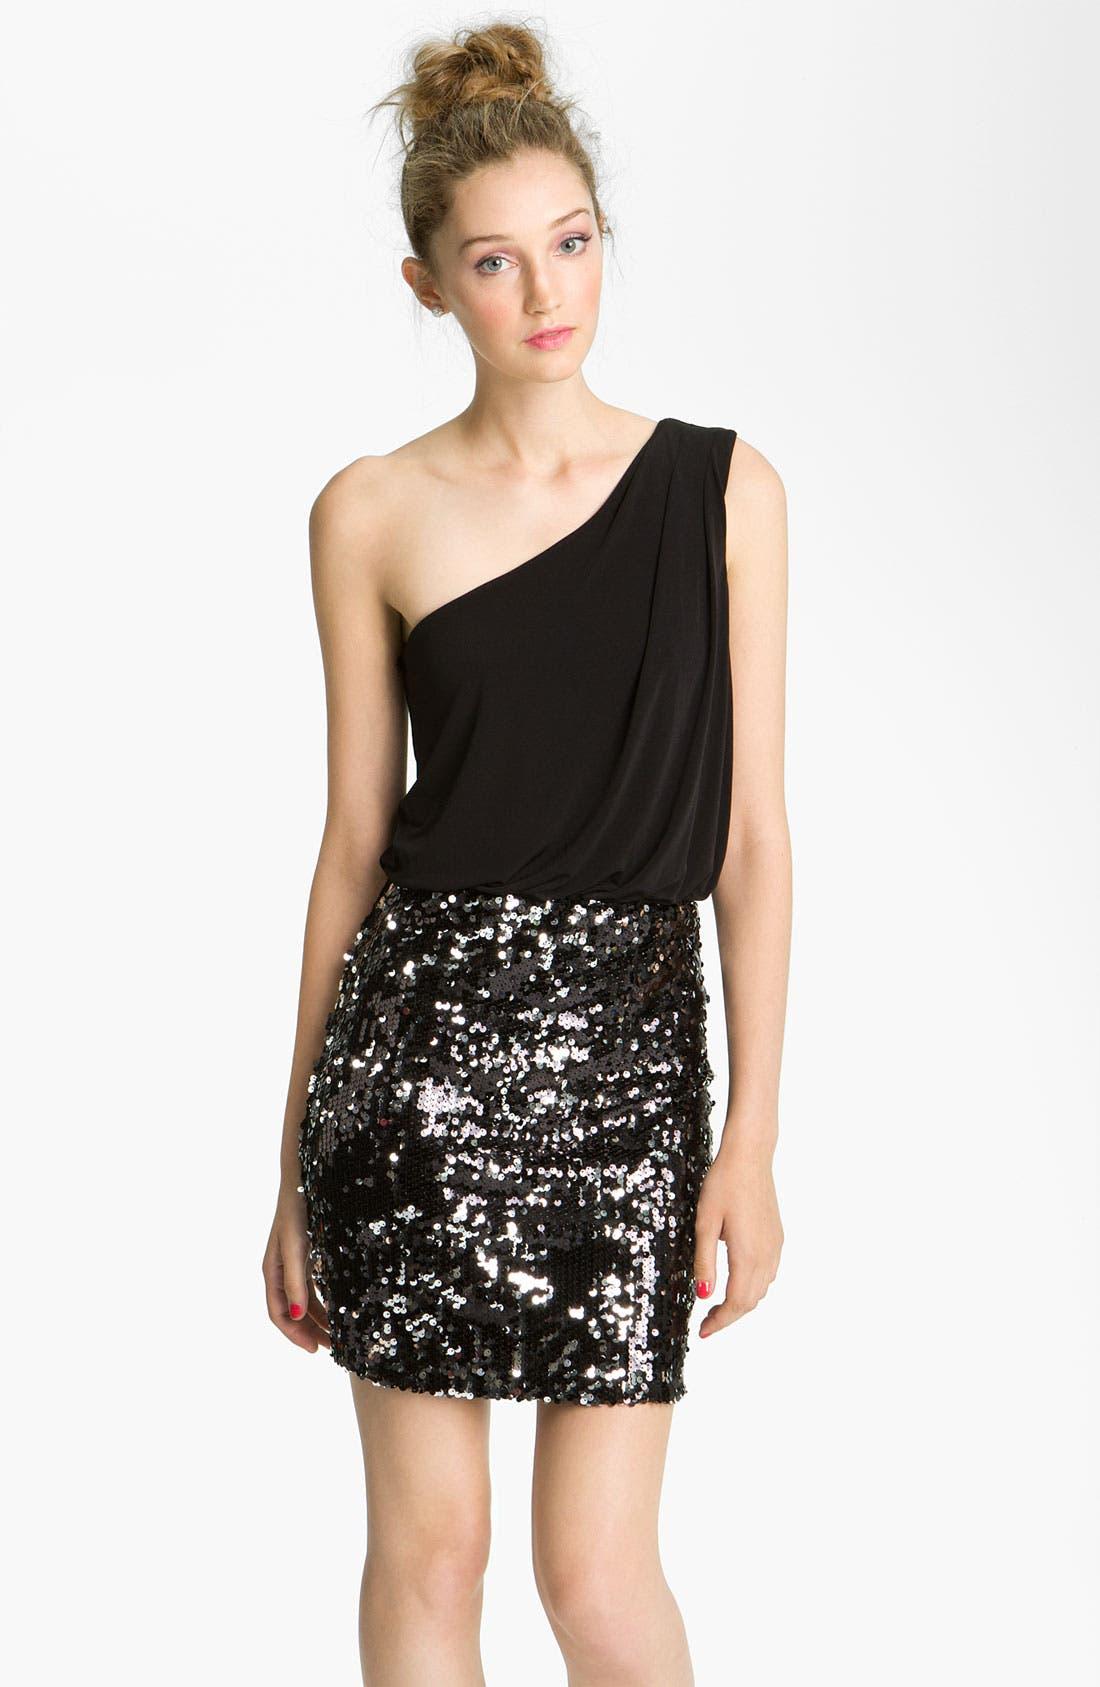 Alternate Image 1 Selected - Way-In Sequin Skirt One Shoulder Dress (Juniors)